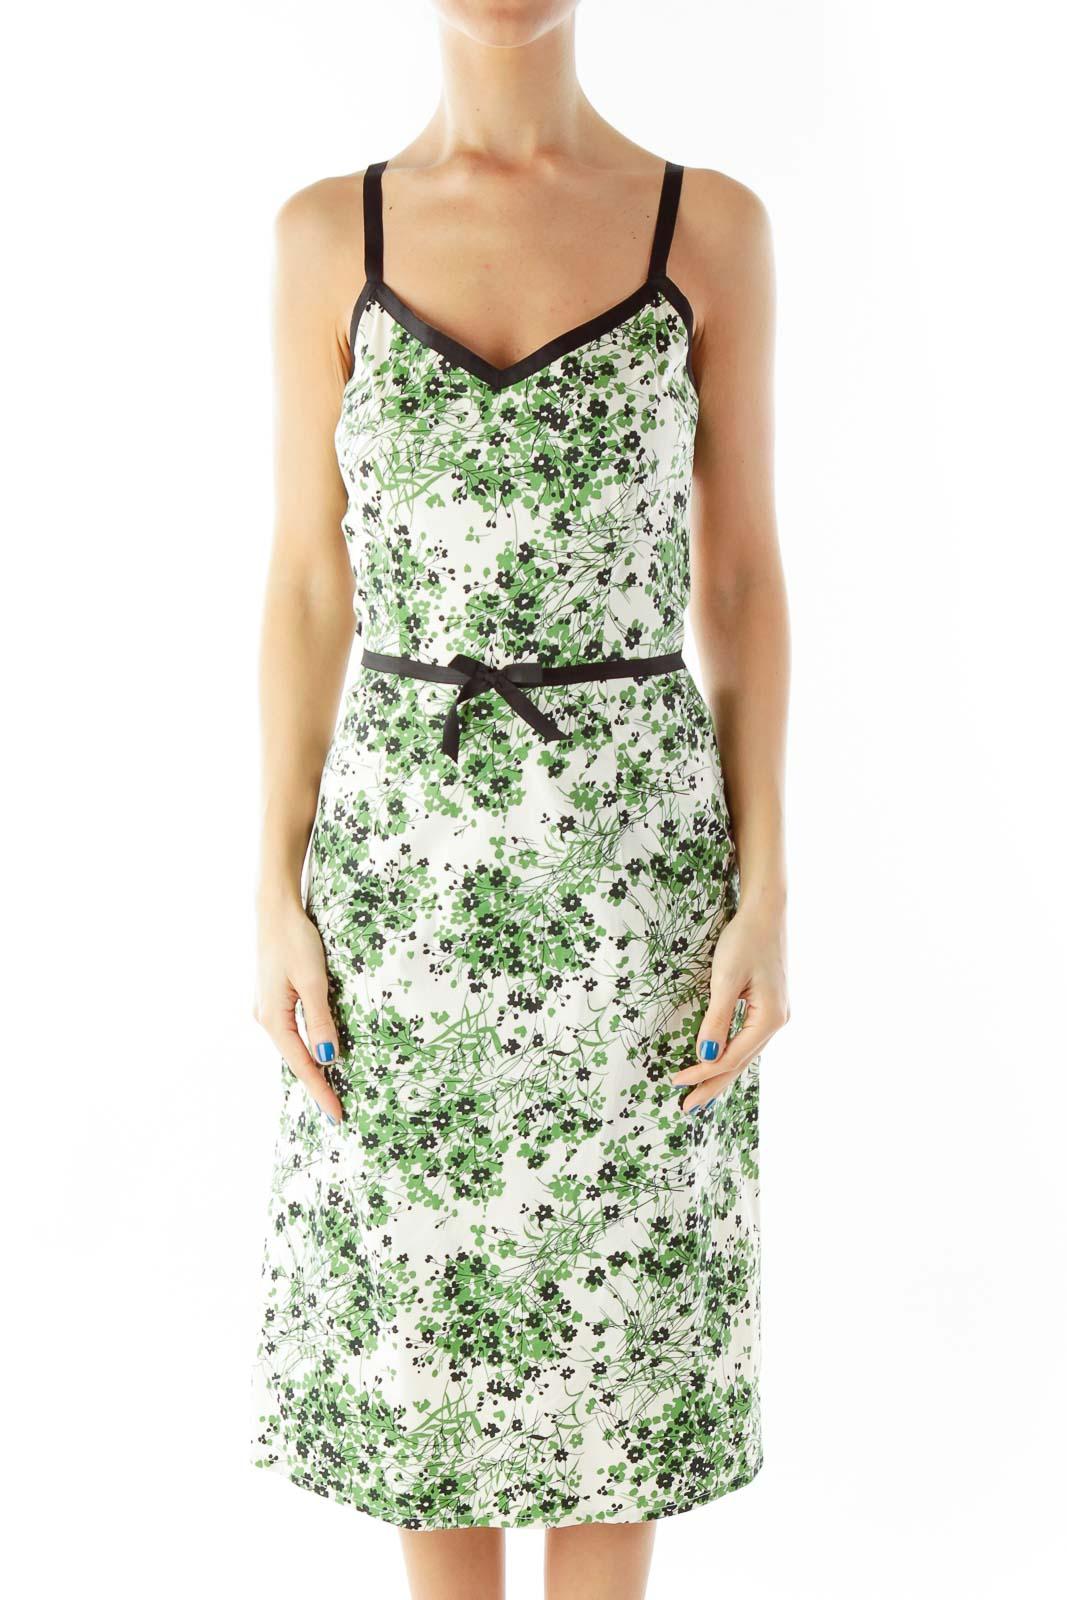 Green Cream Day Dress